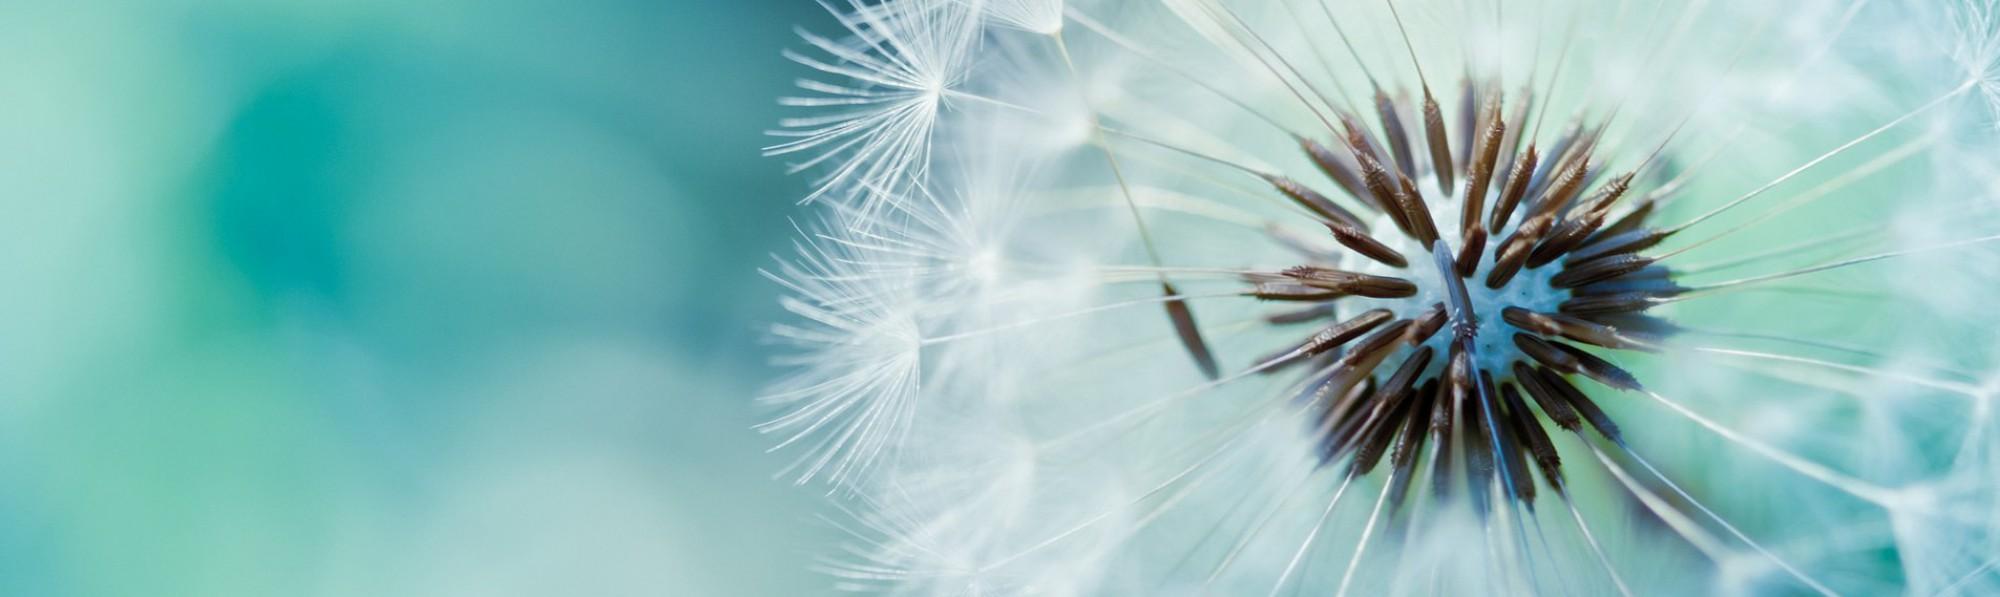 dandelion communications